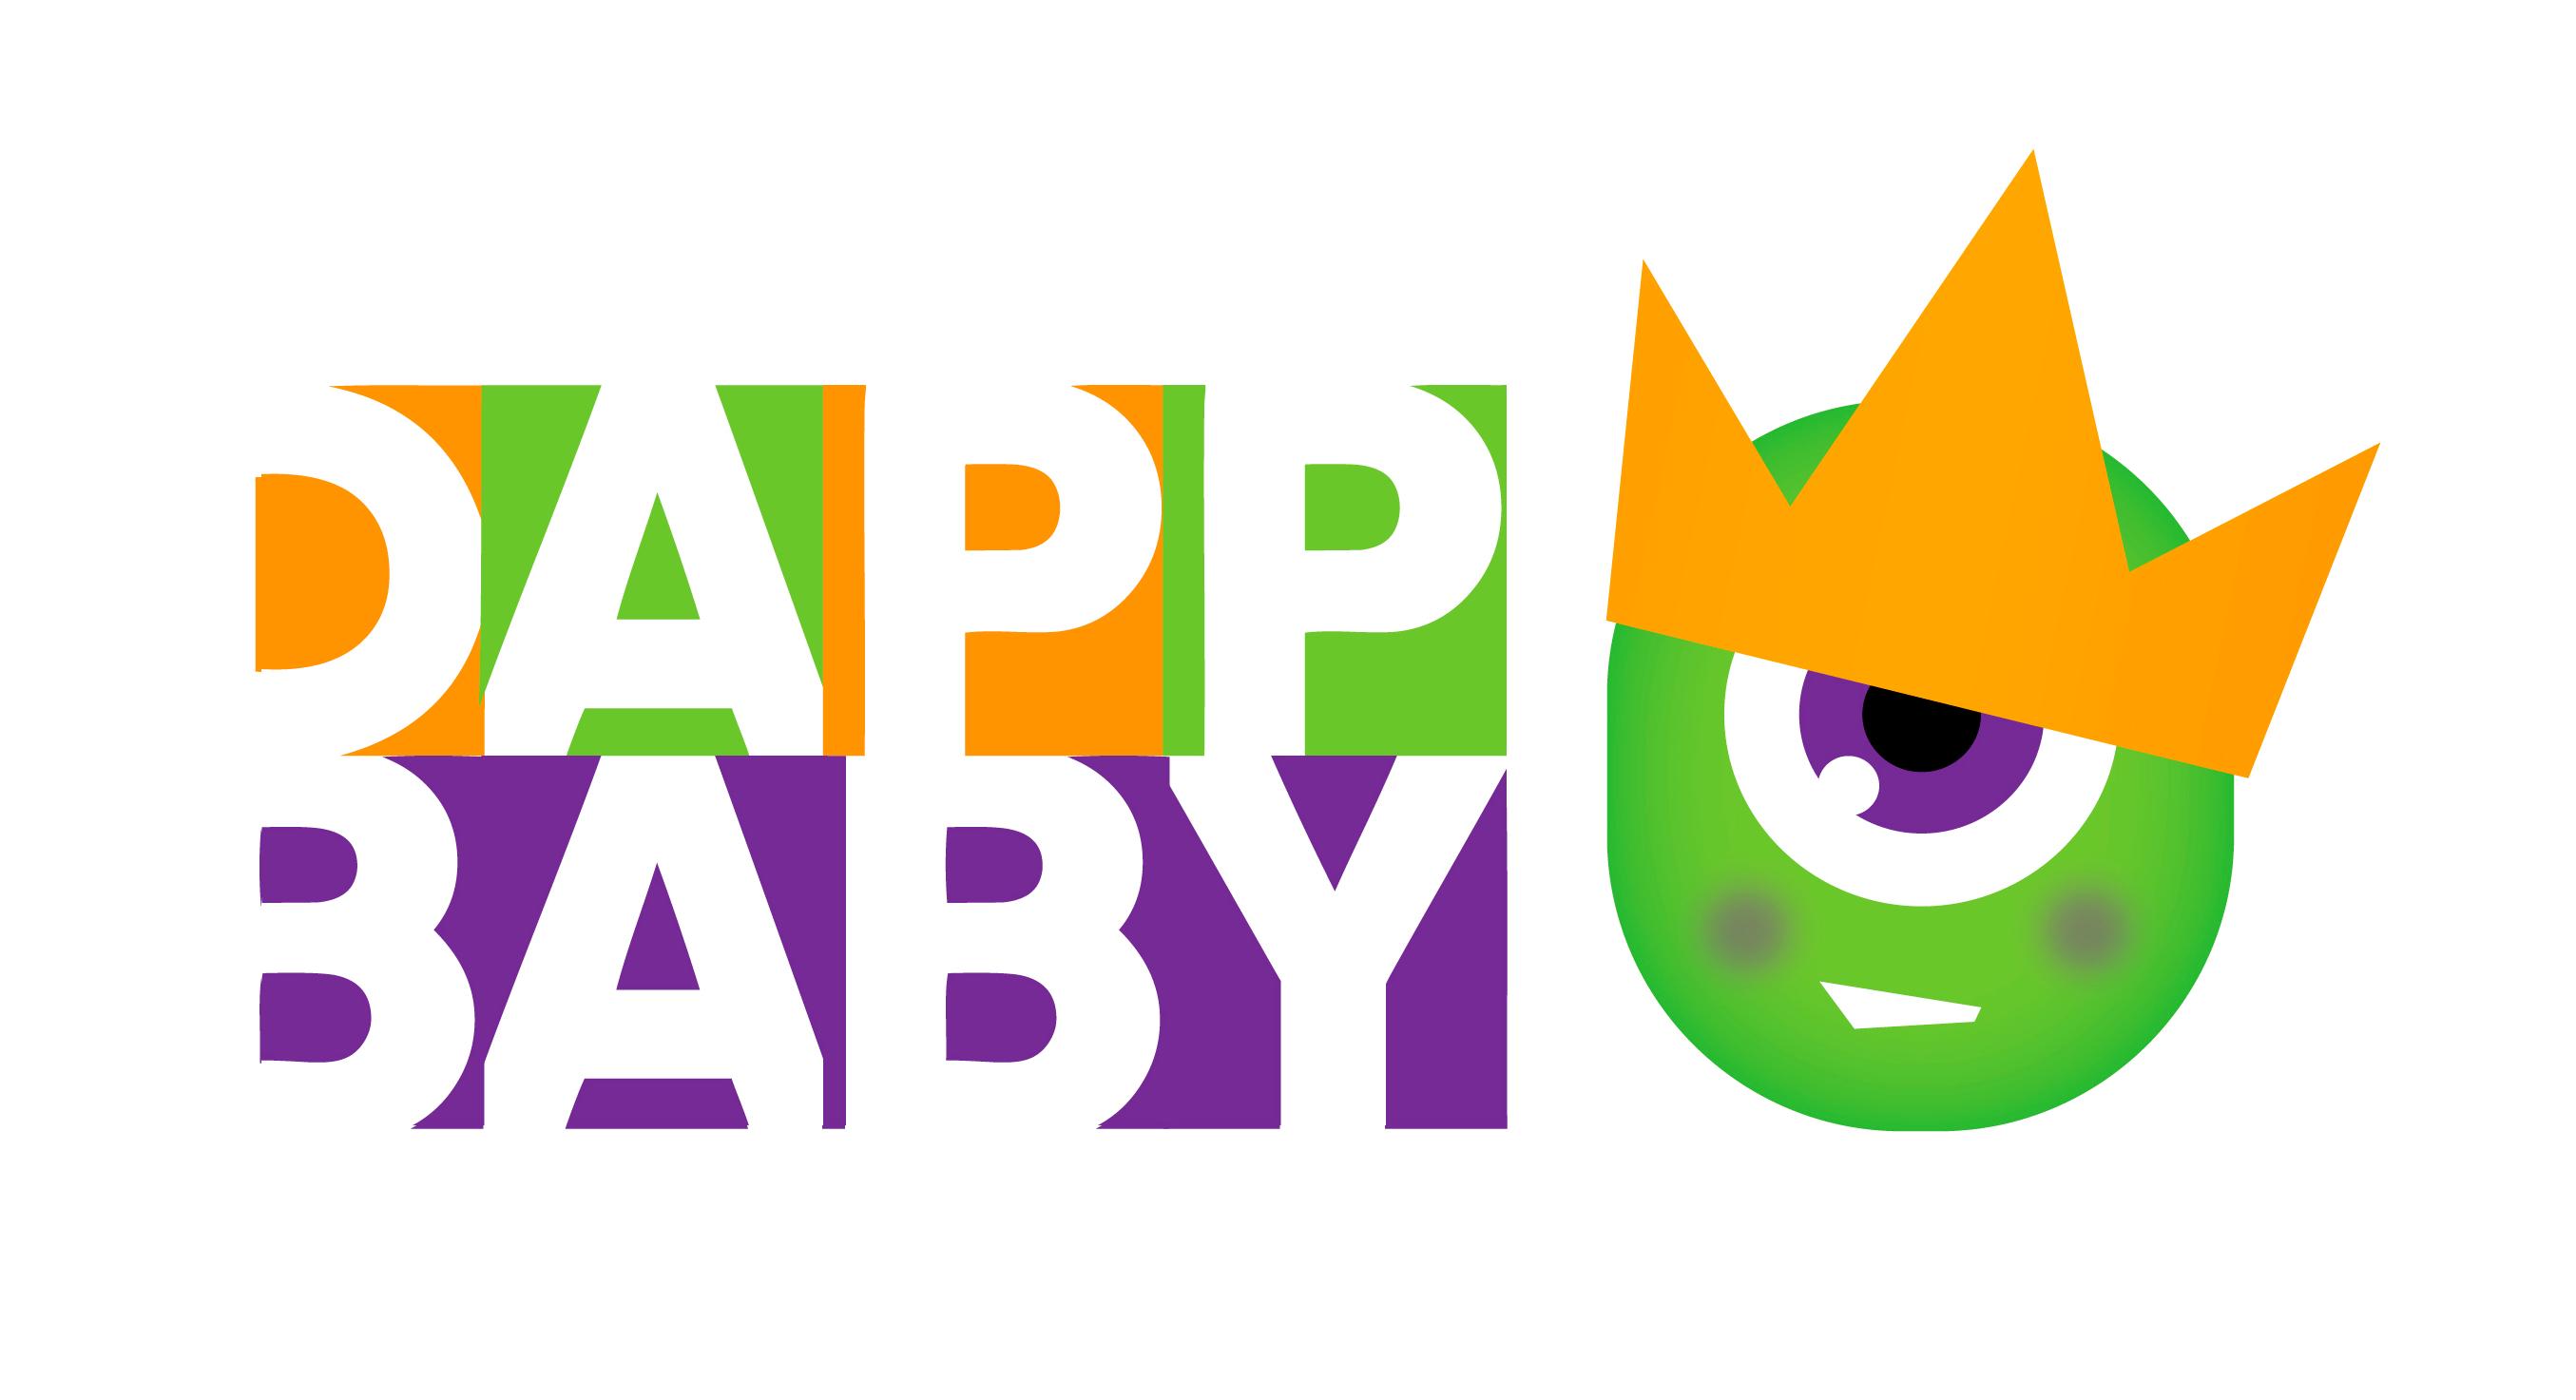 DAPP BABYwww.dappbaby.com